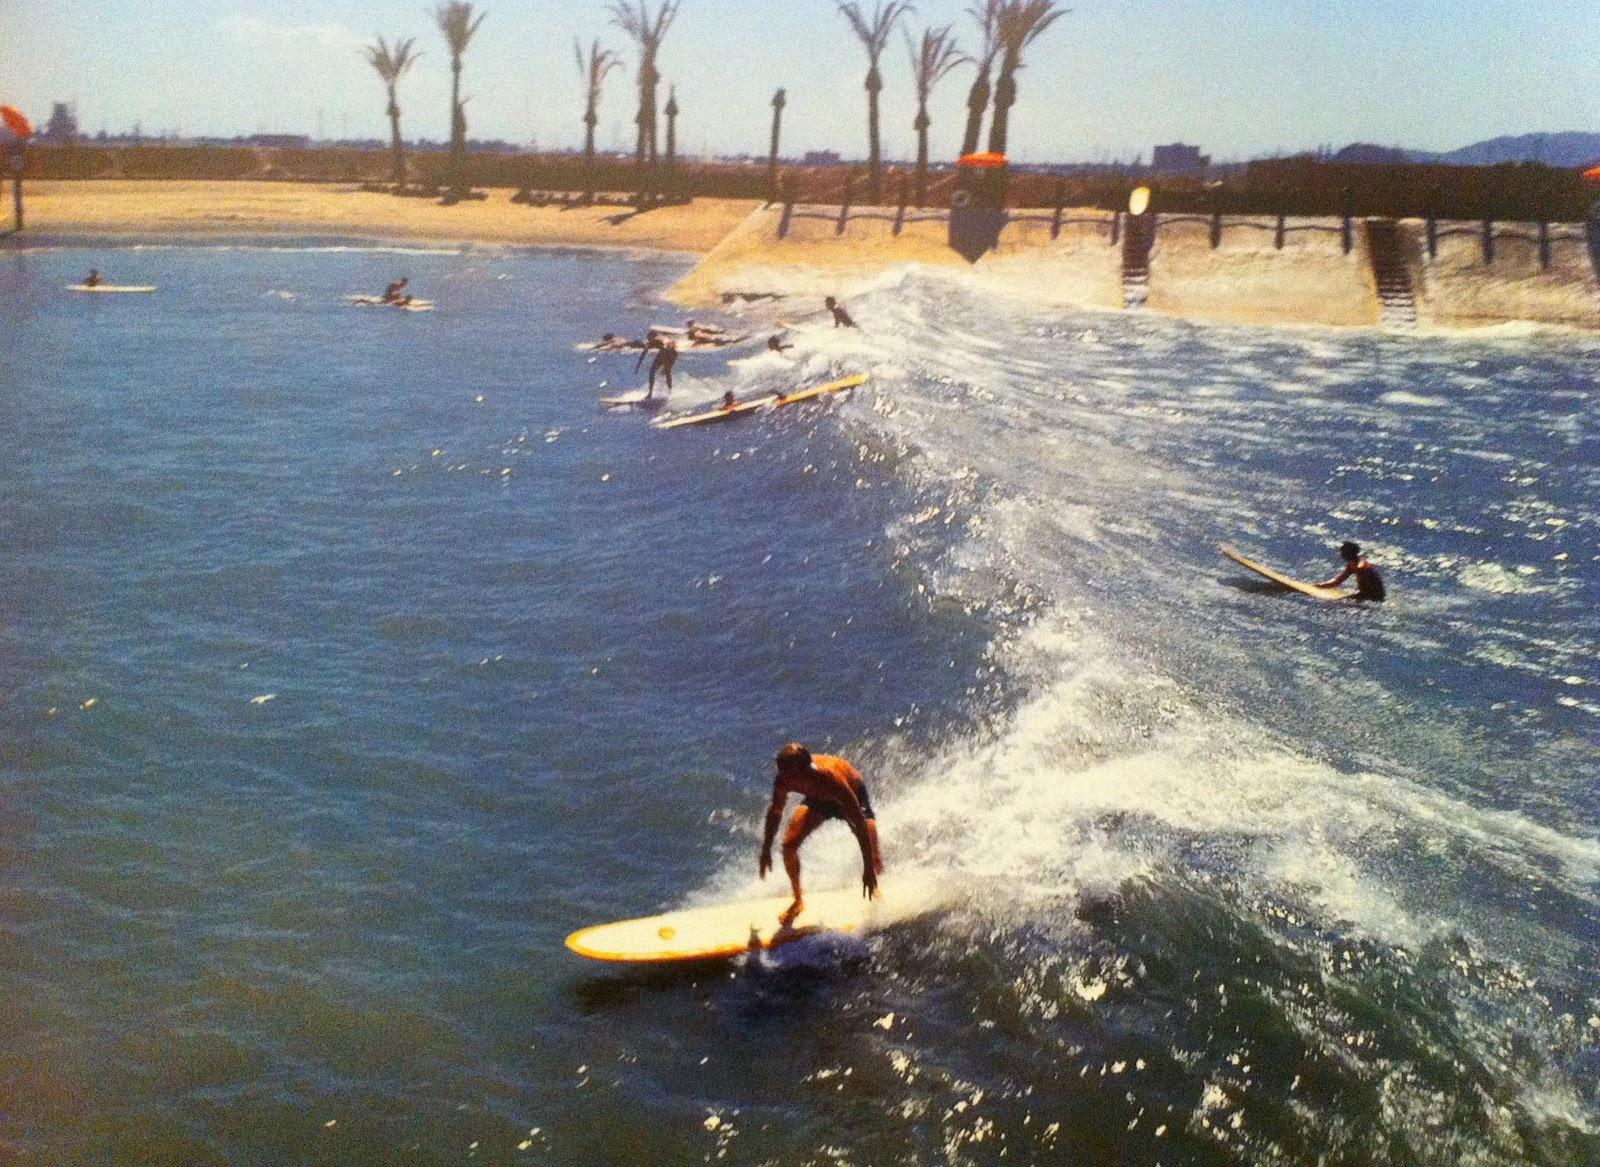 https://lh6.googleusercontent.com/-CJmnHg3c99g/TW5BP3ggCCI/AAAAAAAAAfU/IjkLCvb6nVI/s1600/Surf+pool+arizona2.jpg